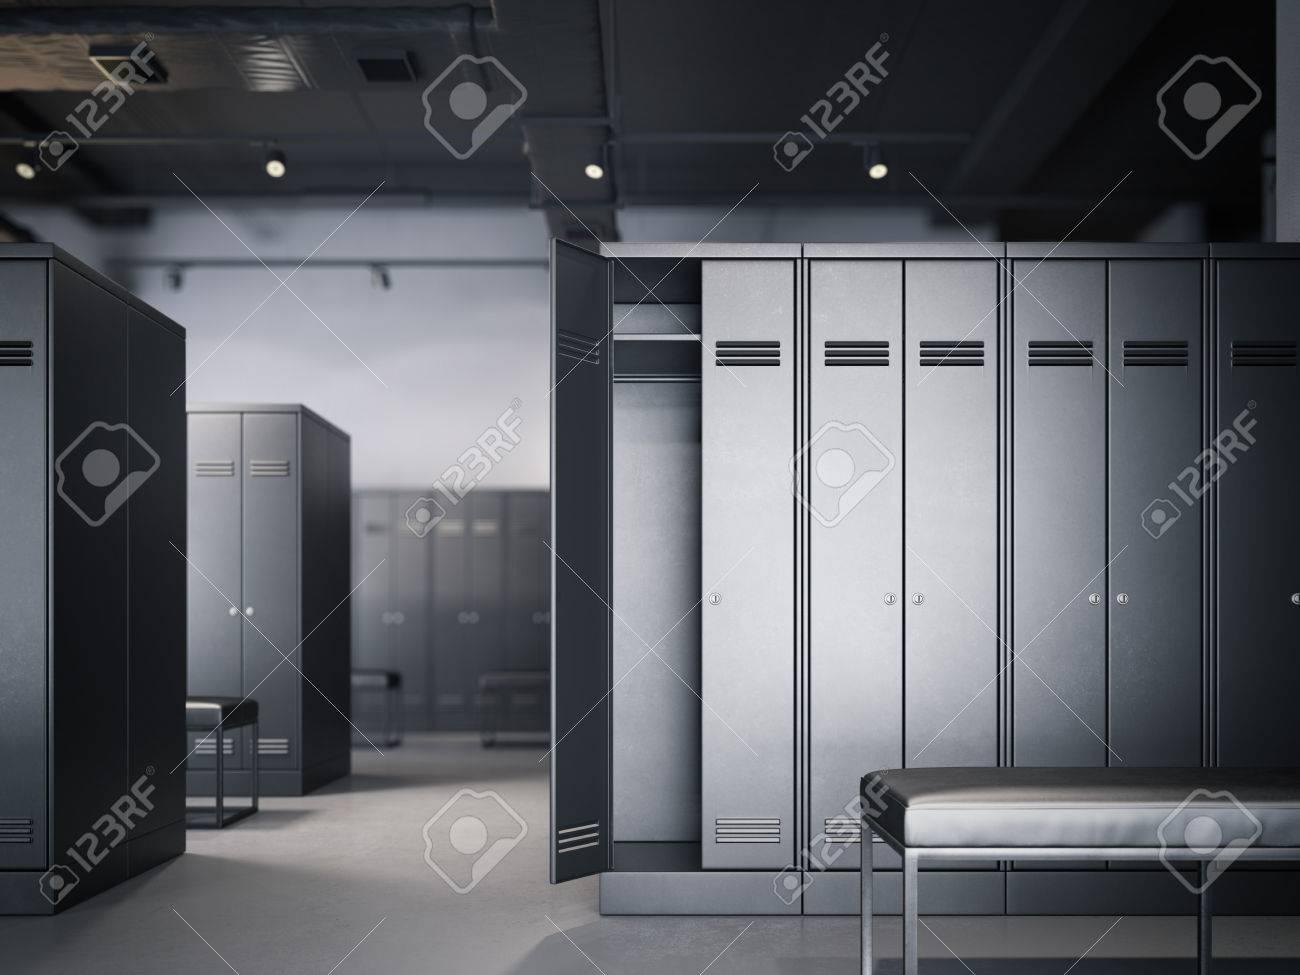 Locker room in modern loft interior with black cabinets. 3d rendering - 68193058